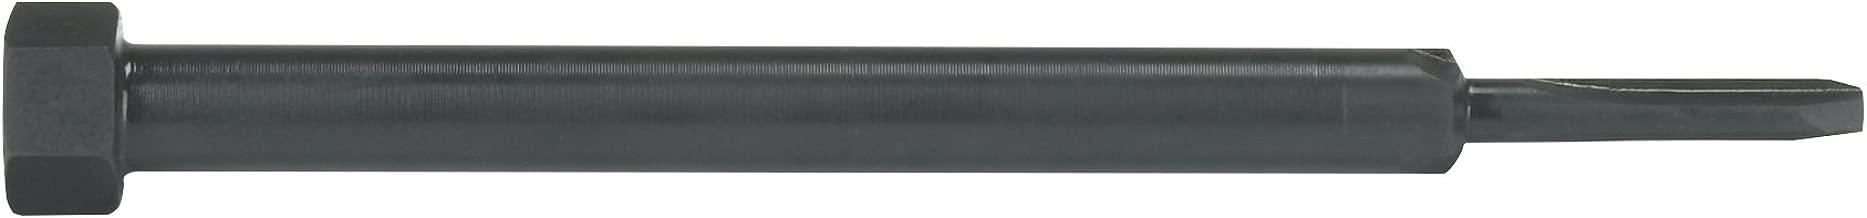 OTC Tools 7223 Glow Plug Bore Reamer